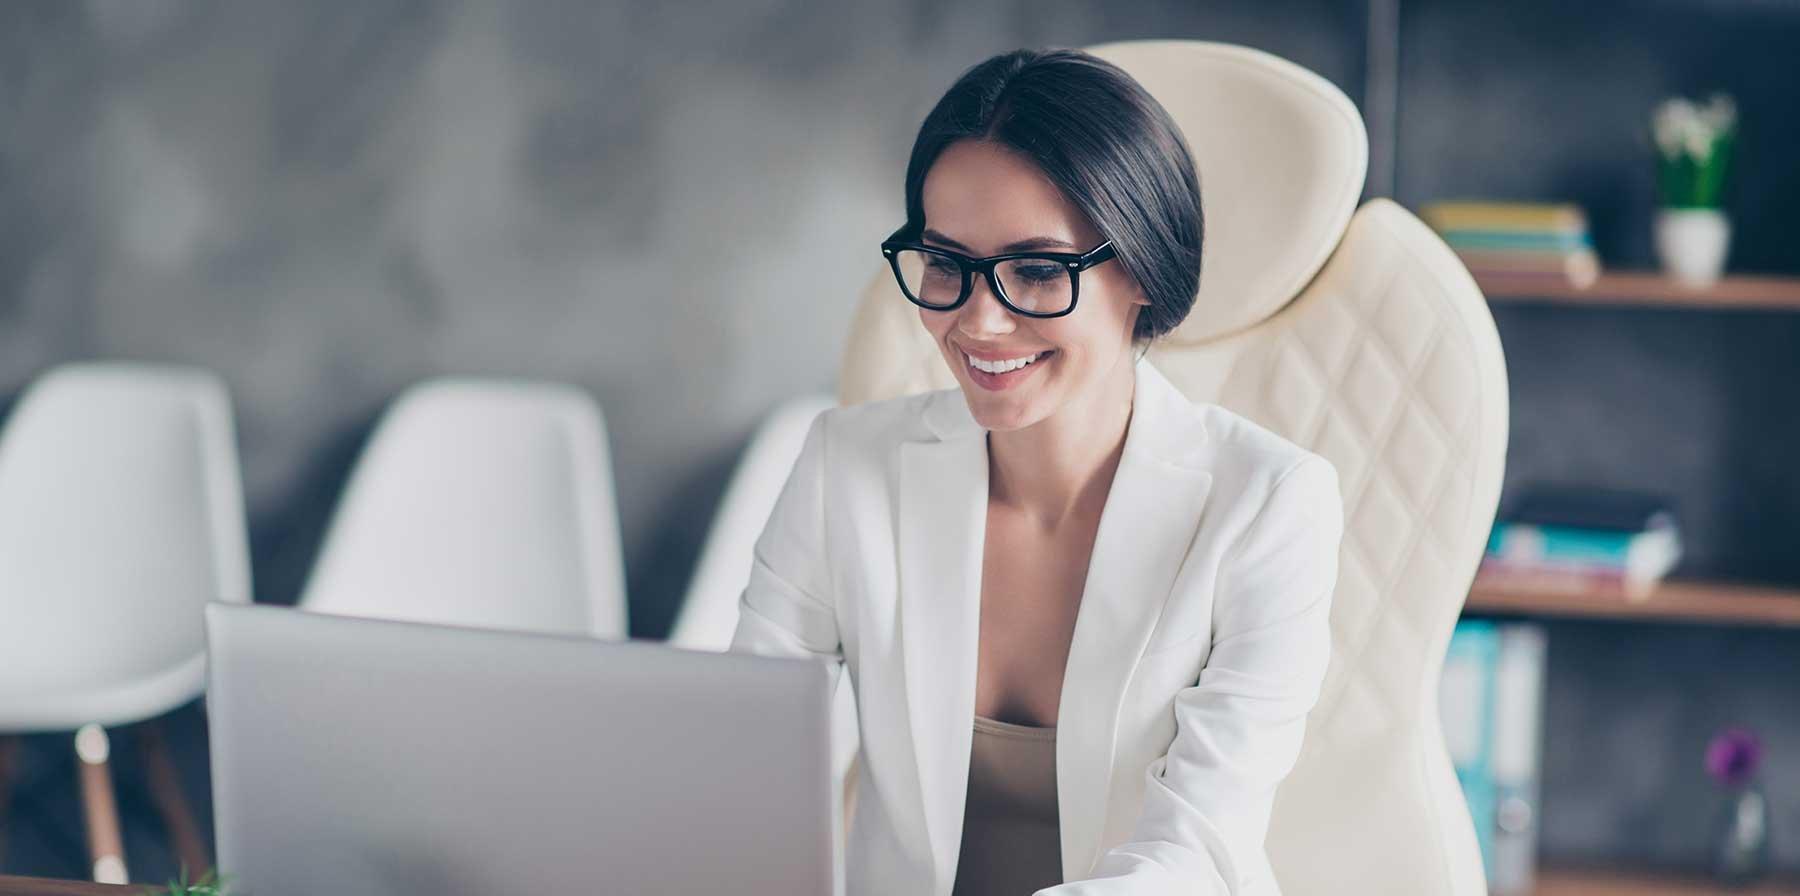 Formulate Webinars - 30 Minutes and On-Demand